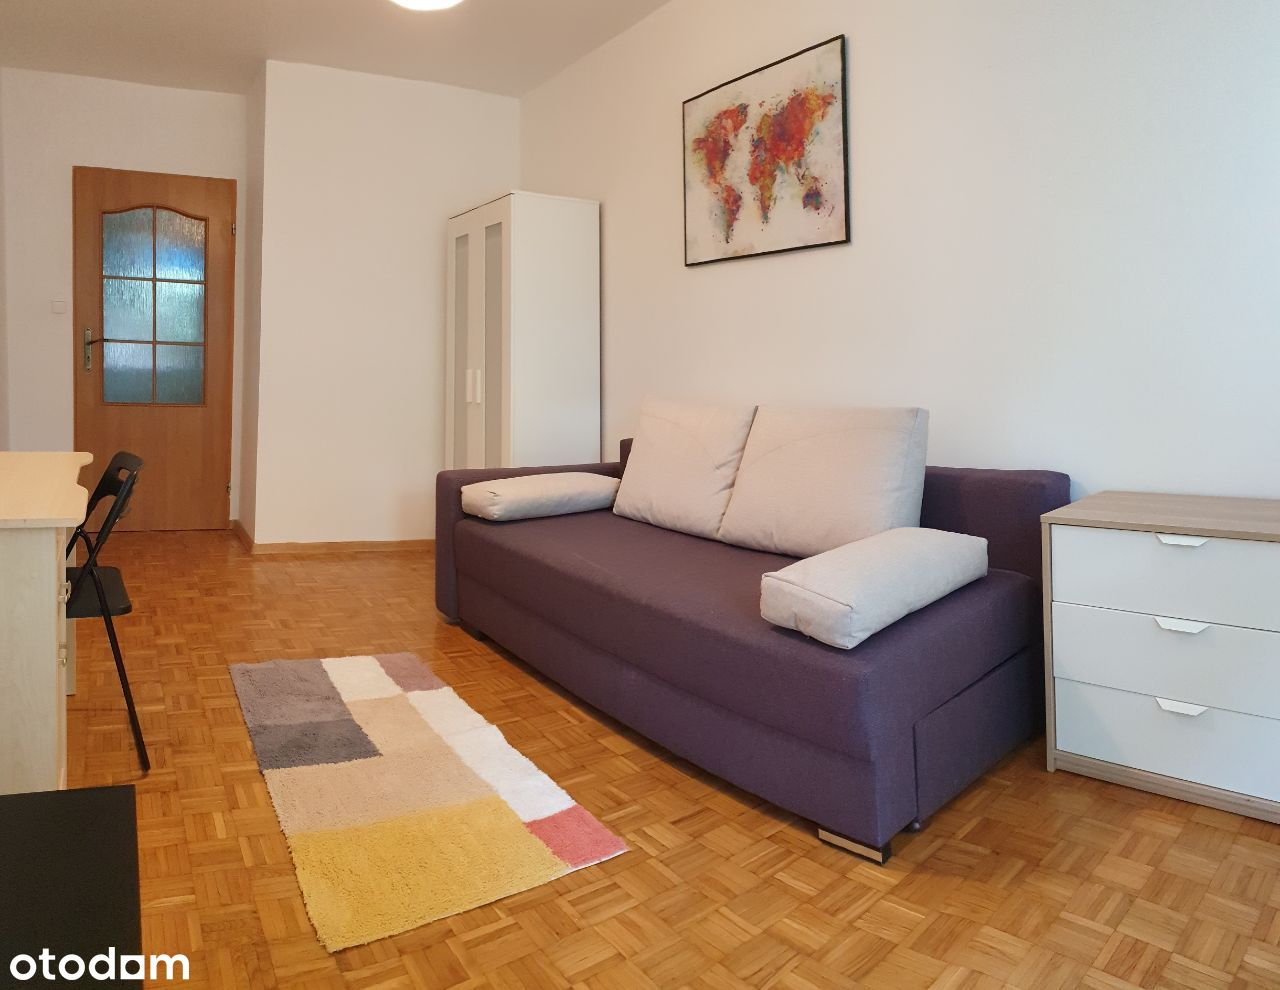 Duży pokój 1os. róg Legnicka/Zachodnia/McDonalds